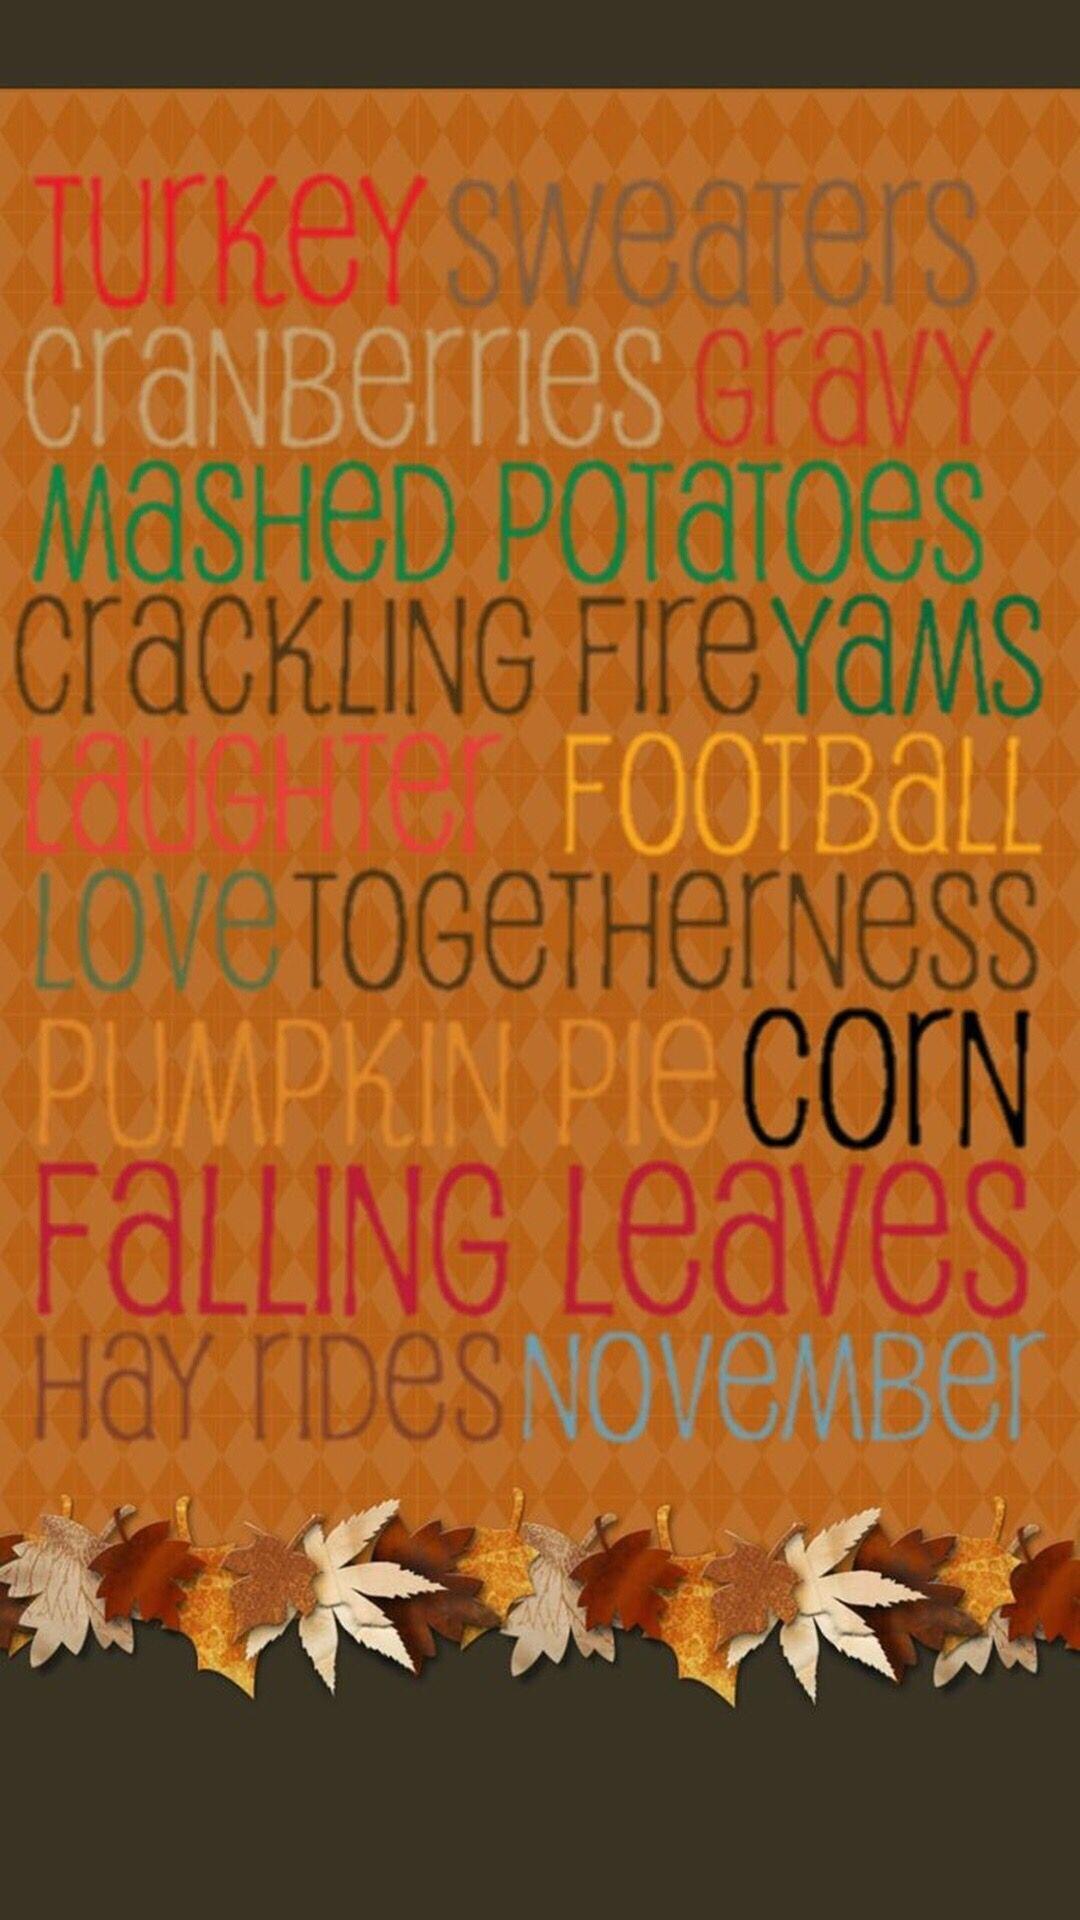 Thanksgiving wallpaper Zedge Thanksgiving wallpaper